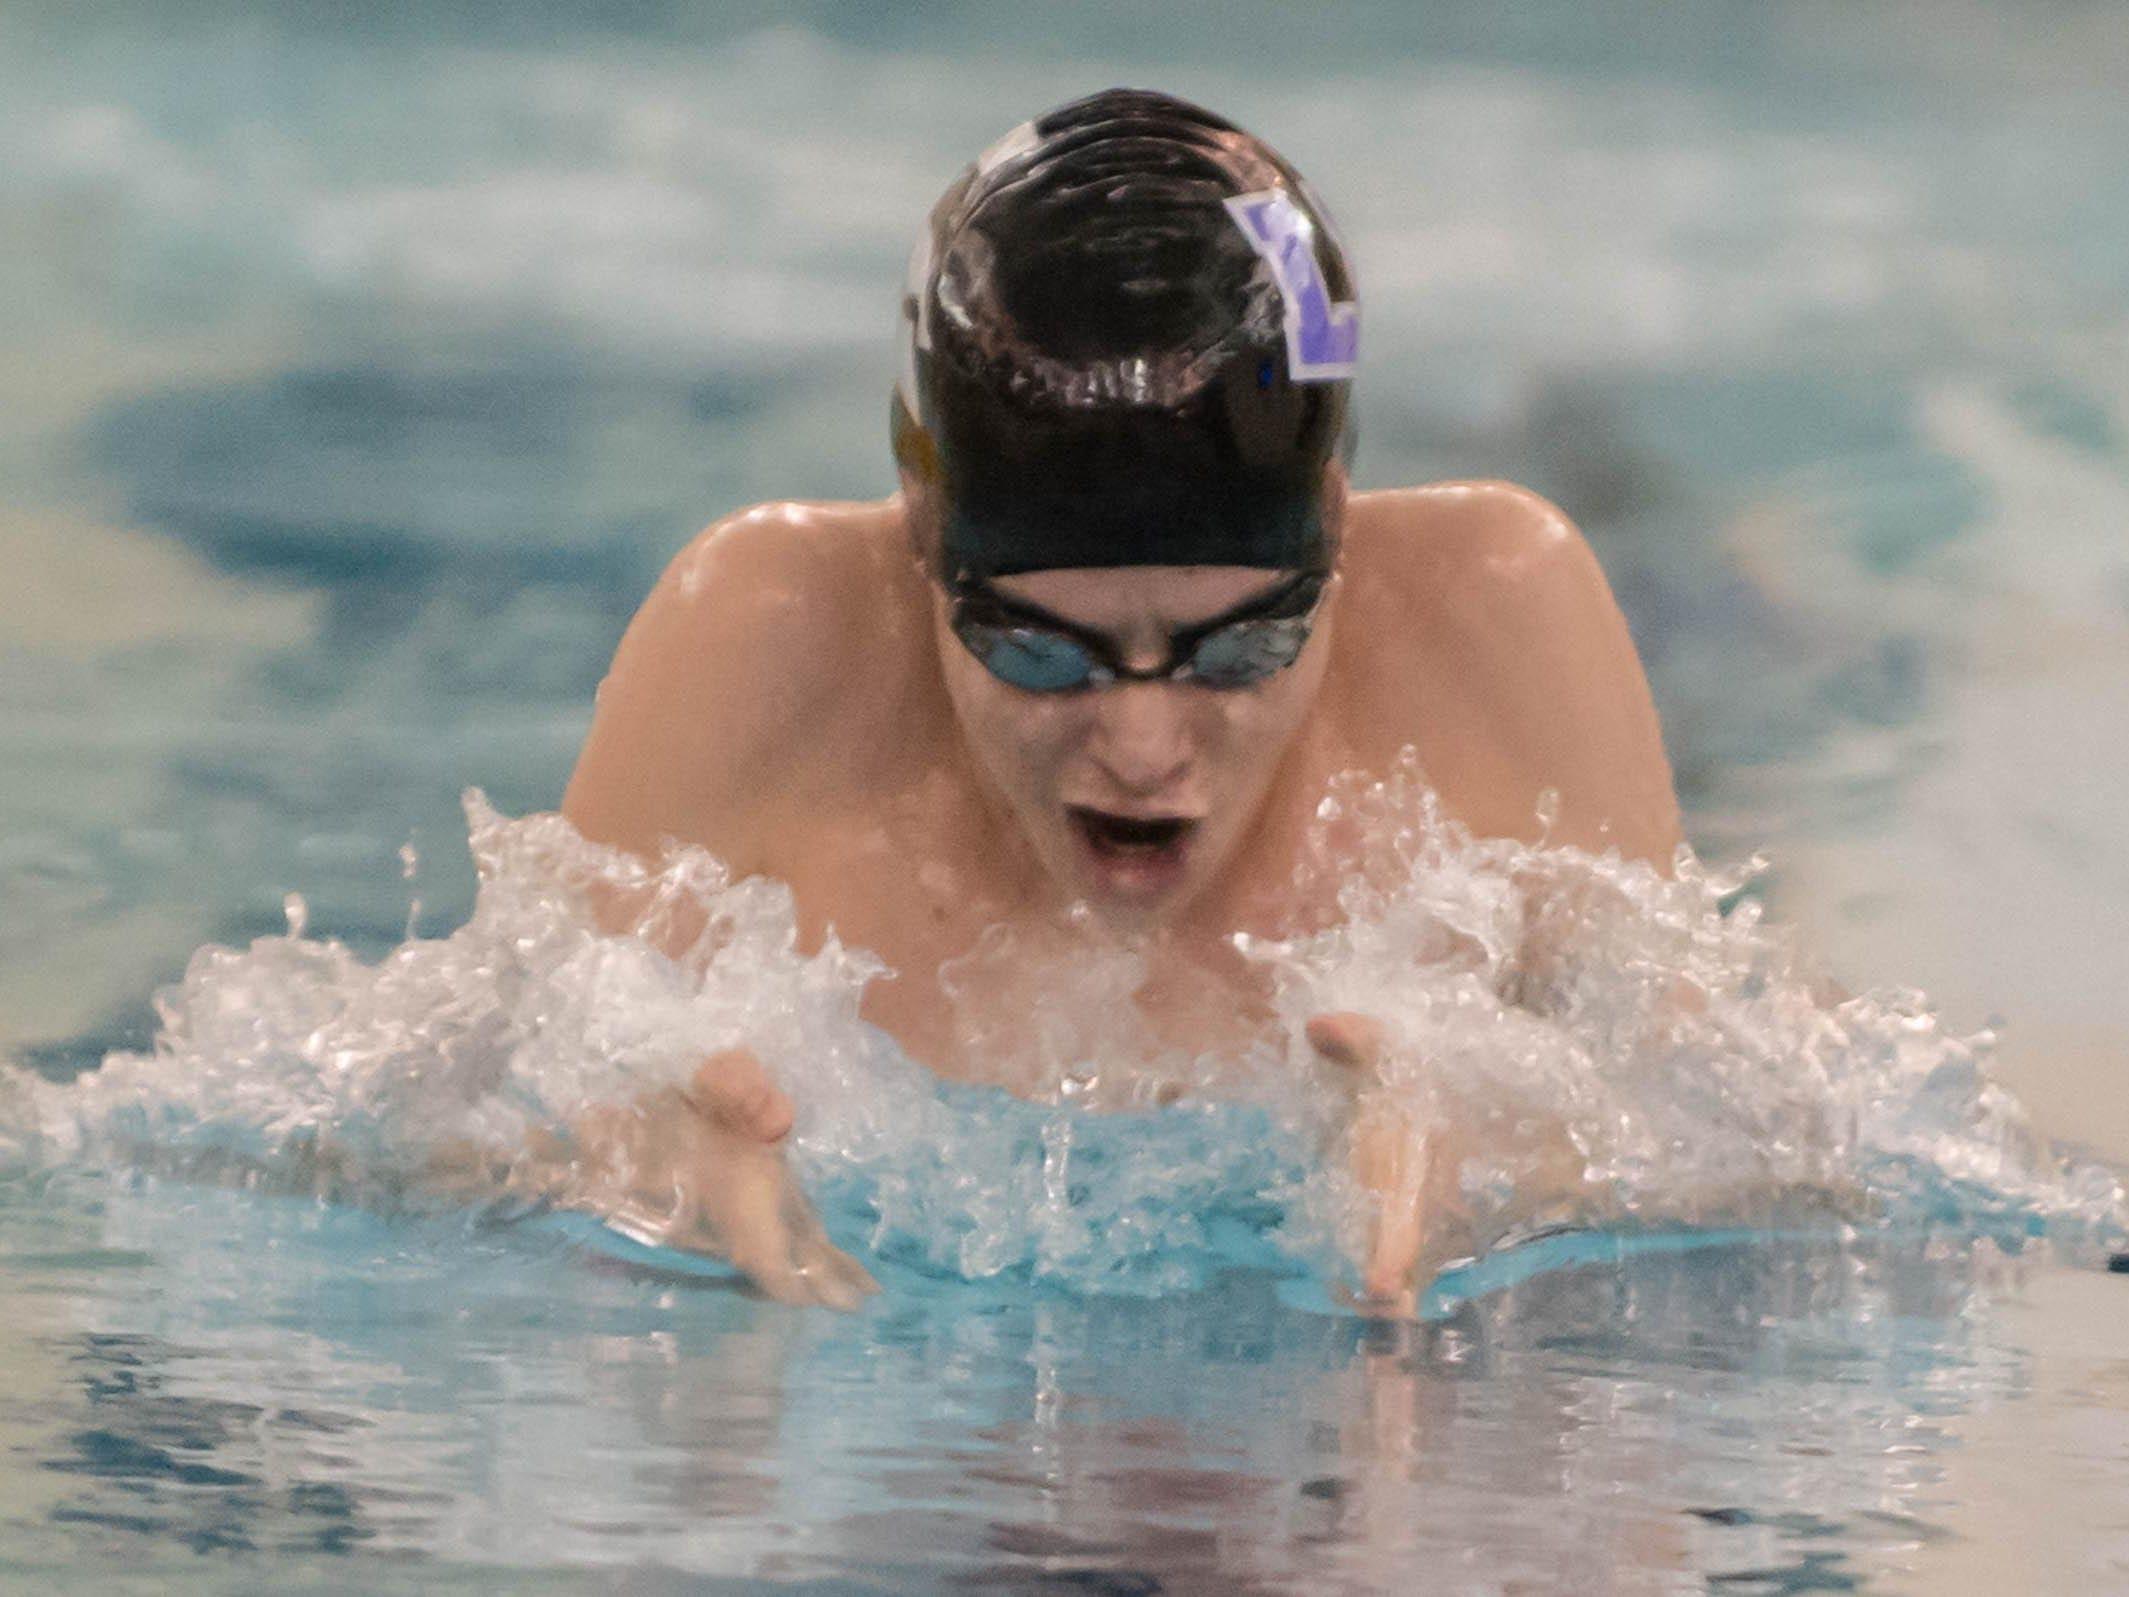 Lakeview's Braden Shanks is set for his senior season in the pool.